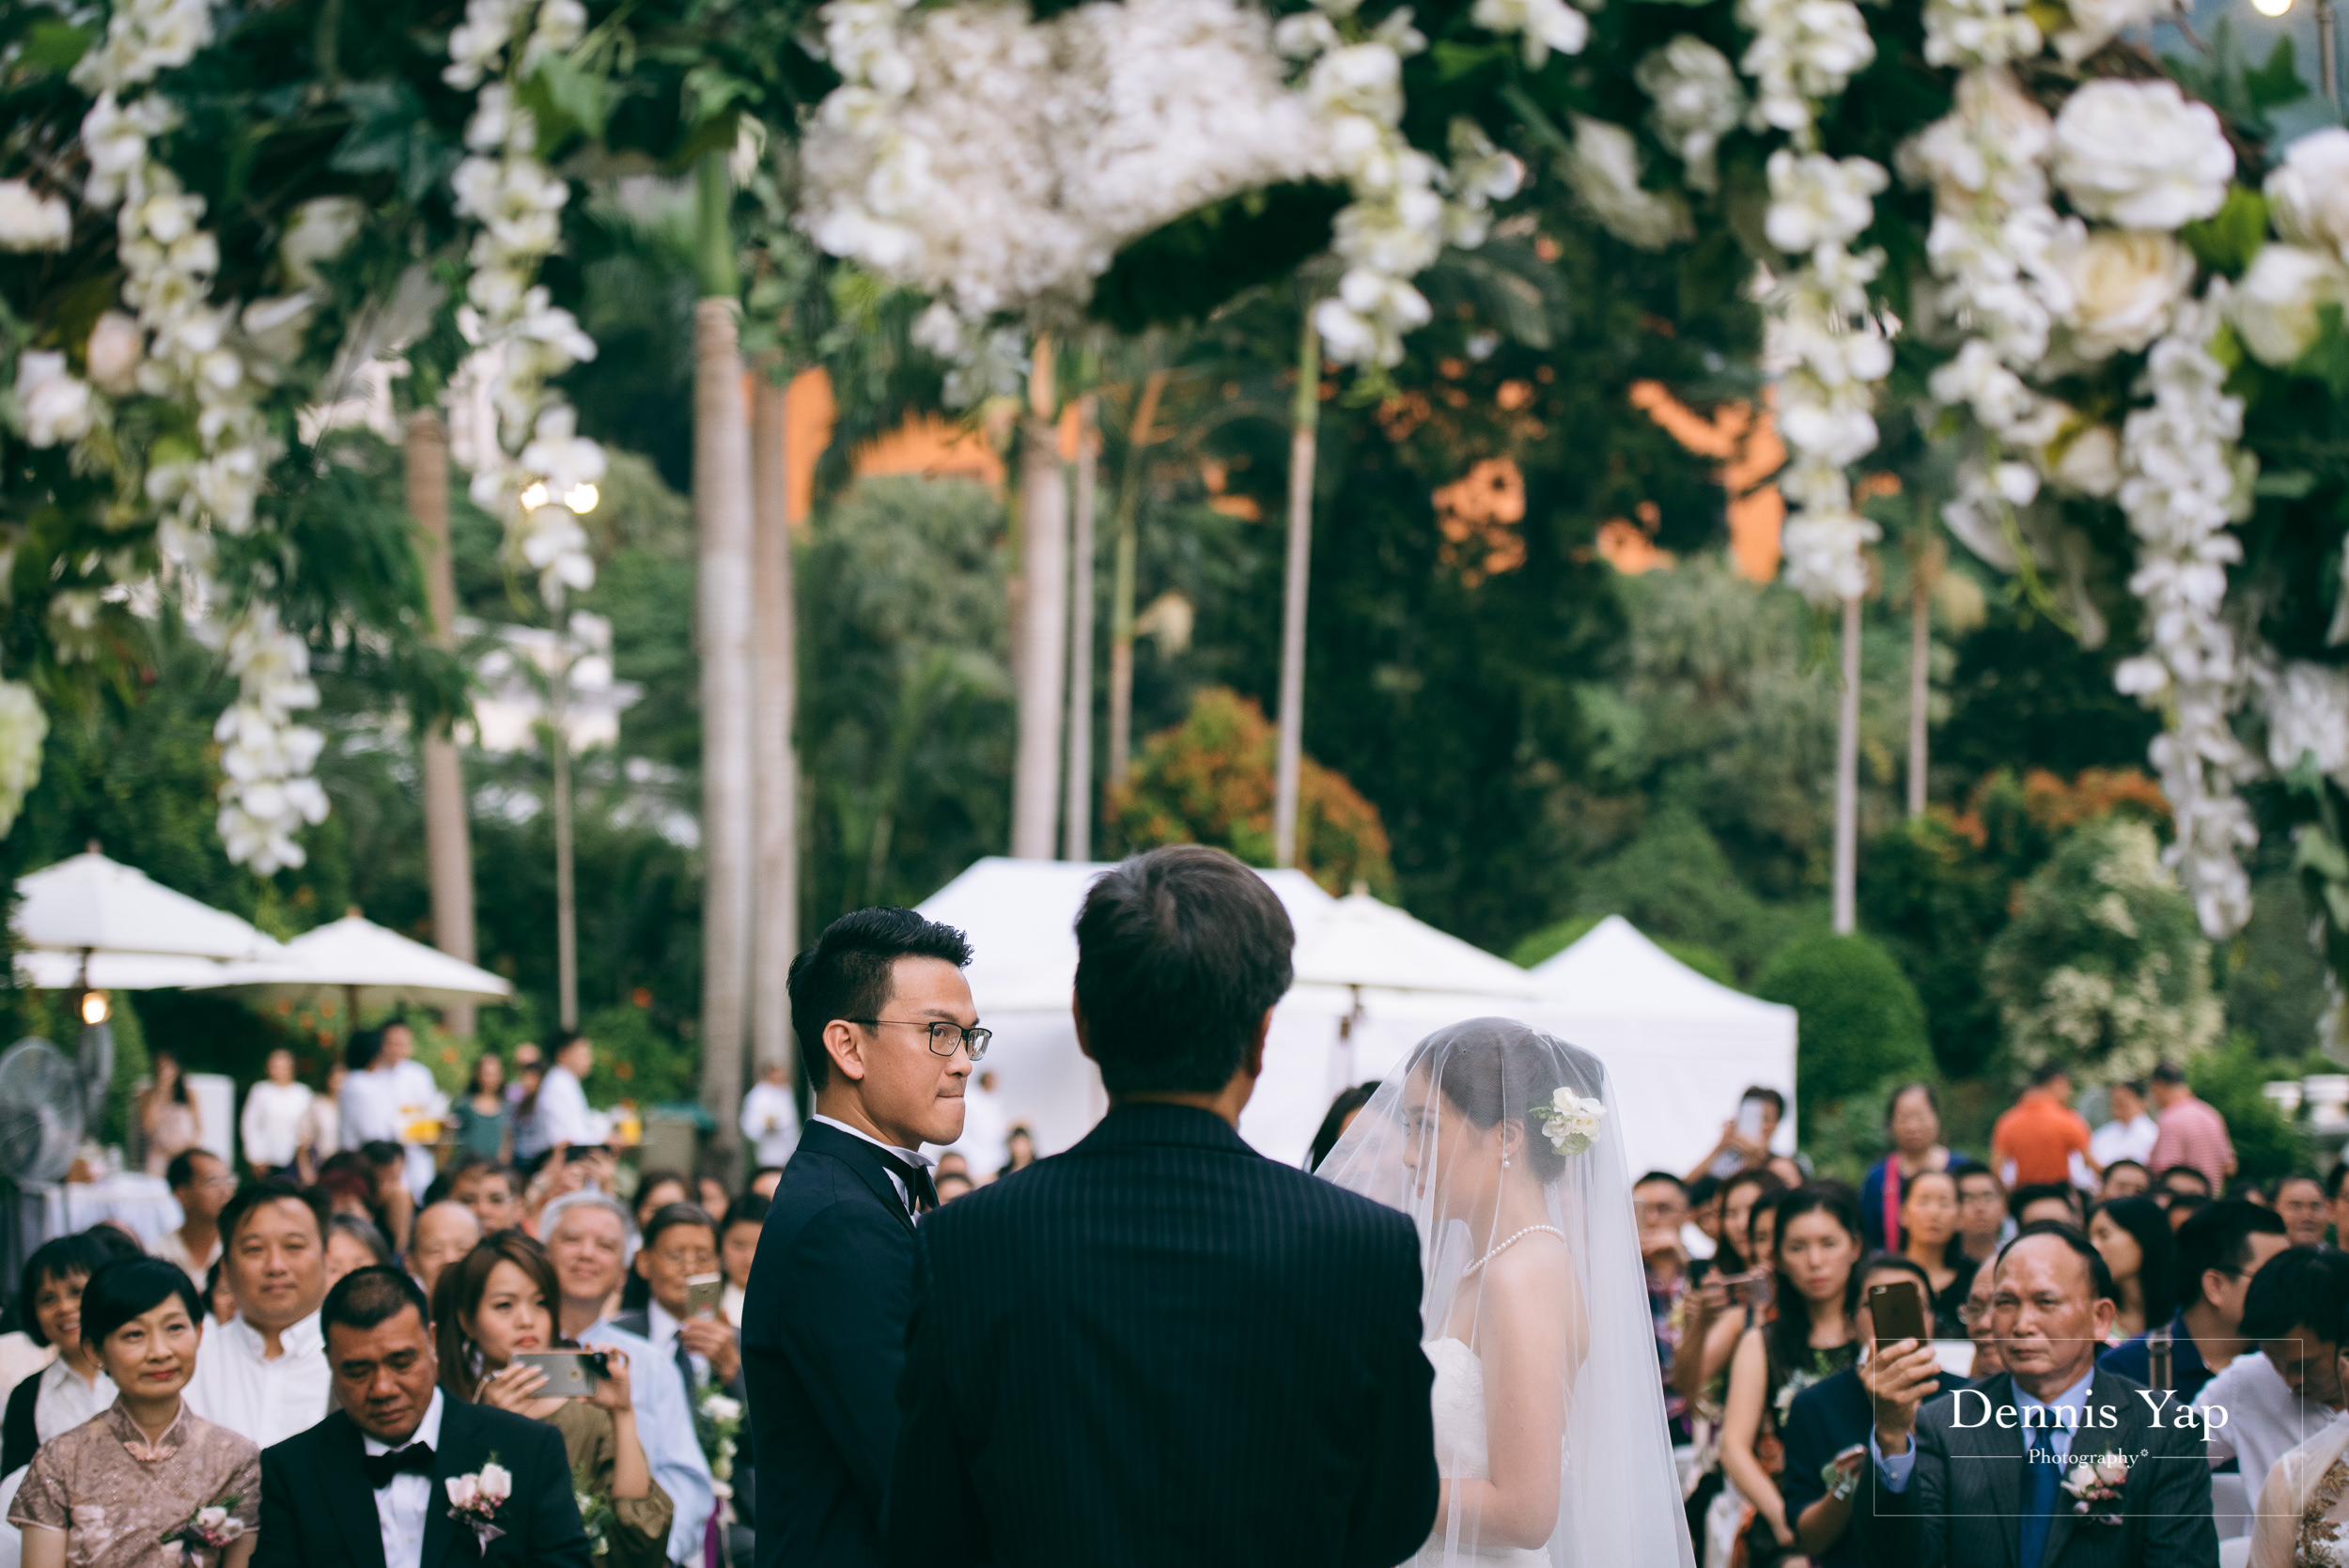 jason crystal wedding day gate crash hong kong garden wedding dennis yap photography-28.jpg